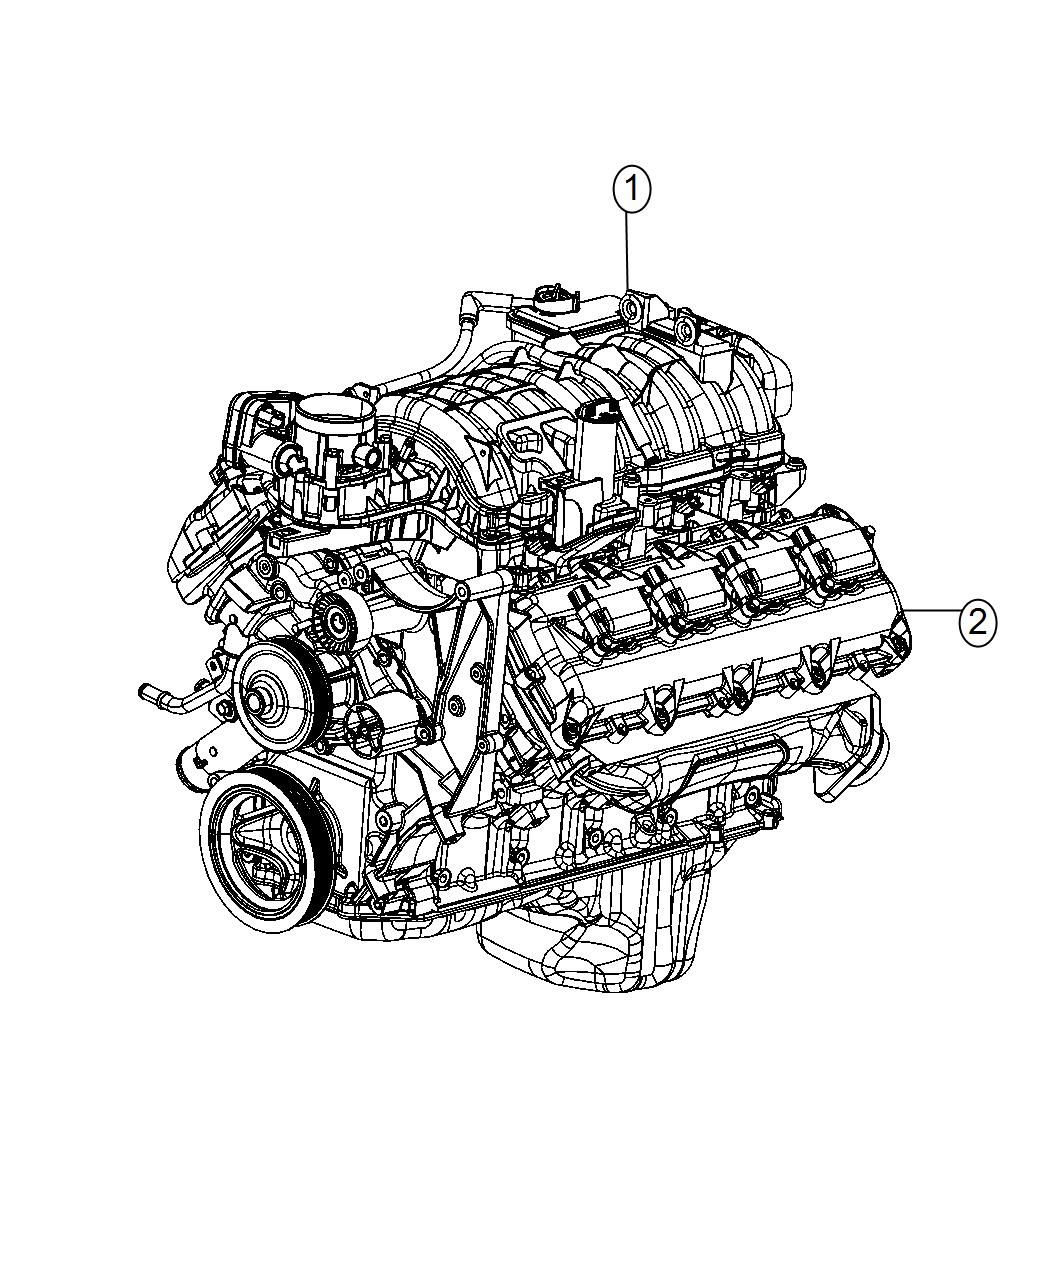 Ram Engine Long Block Engine Oil Cooler